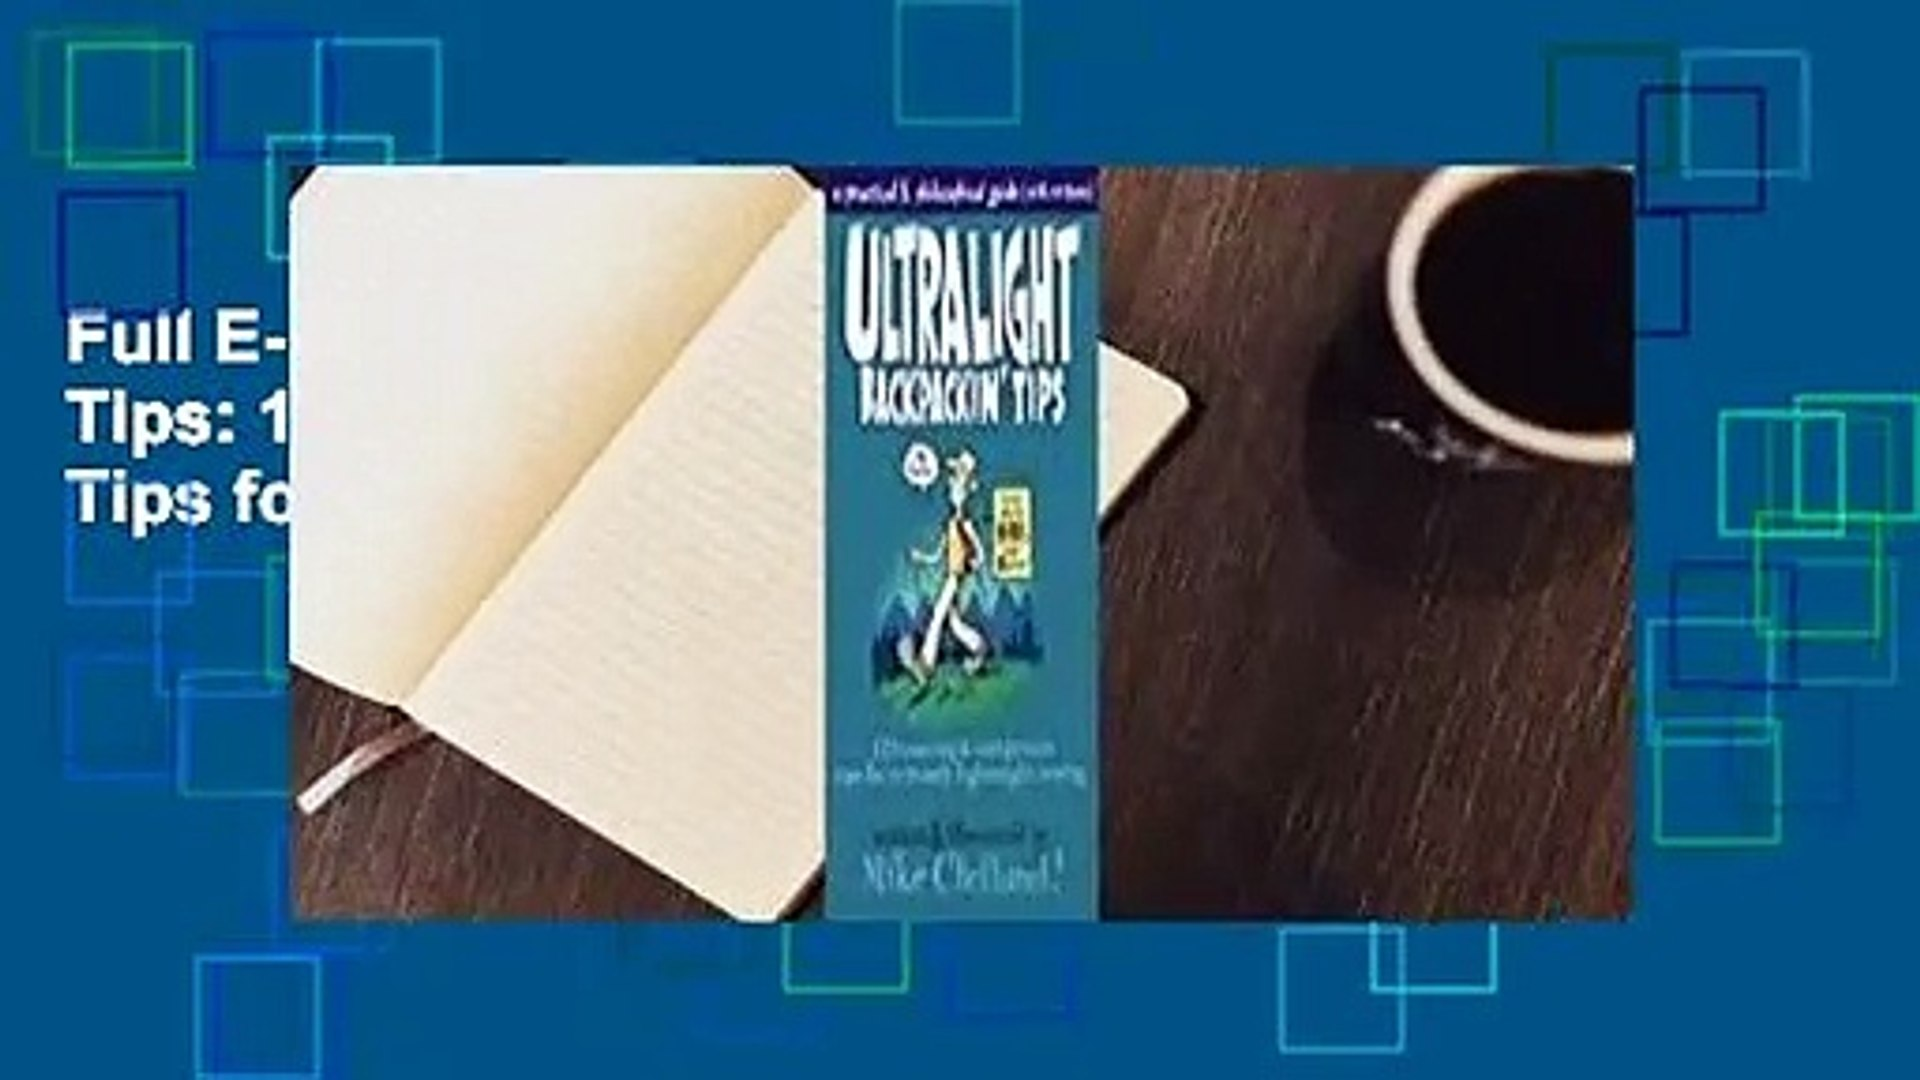 Full E-book Ultralight Backpackin' Tips: 153 Amazing & Inexpensive Tips for Extremely Light